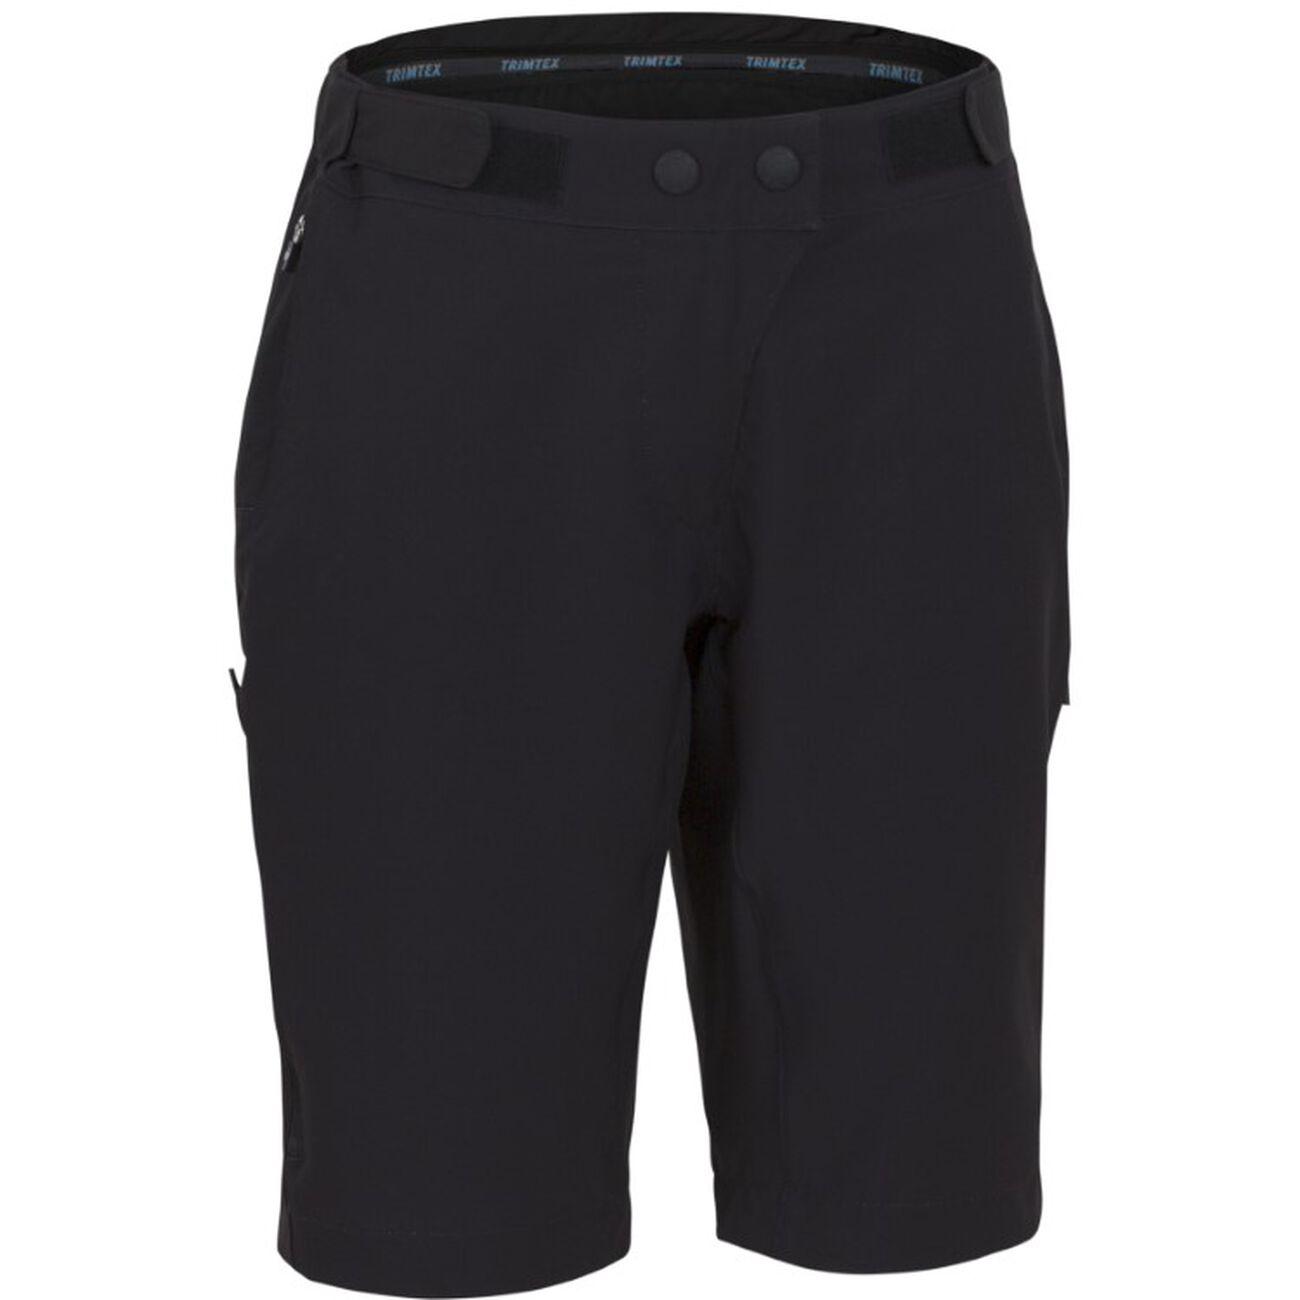 Enduro Shorts Women